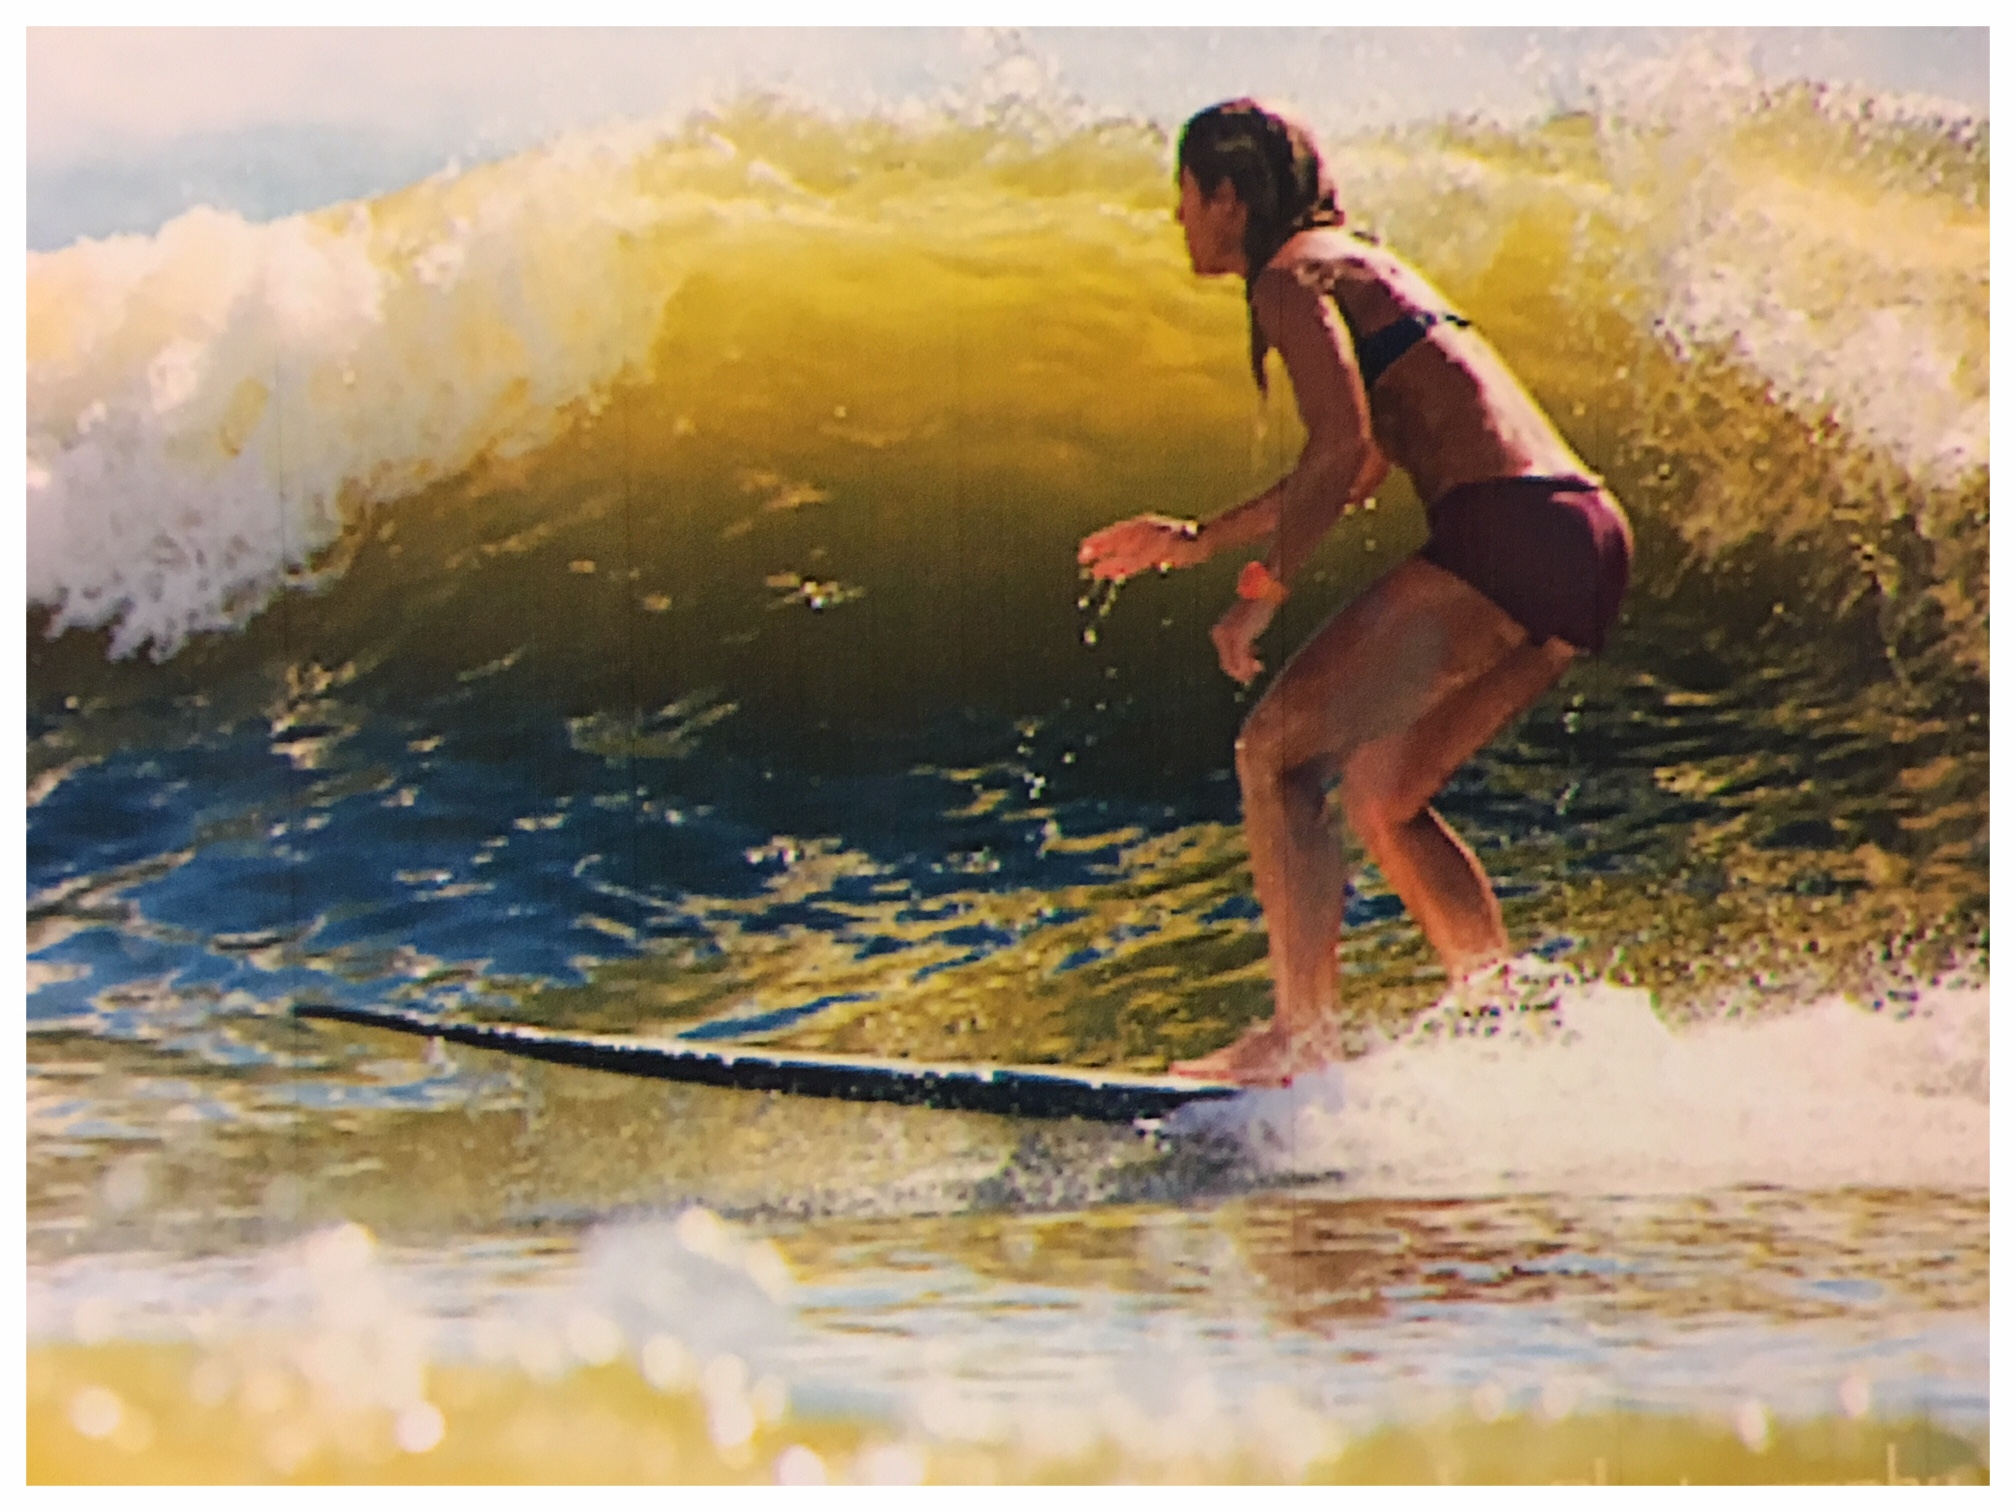 Local surfer Mary Gordon Kerr